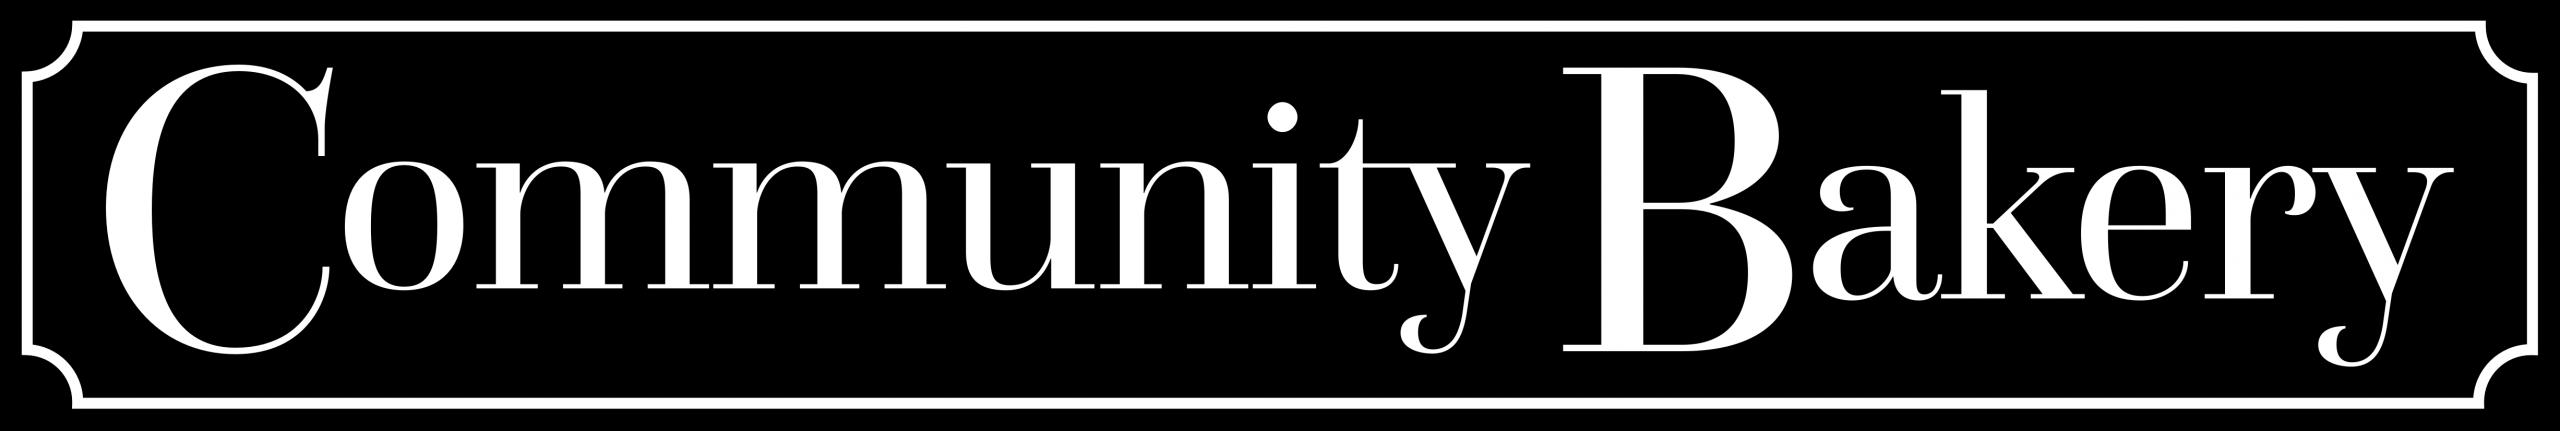 Community Bakery Online